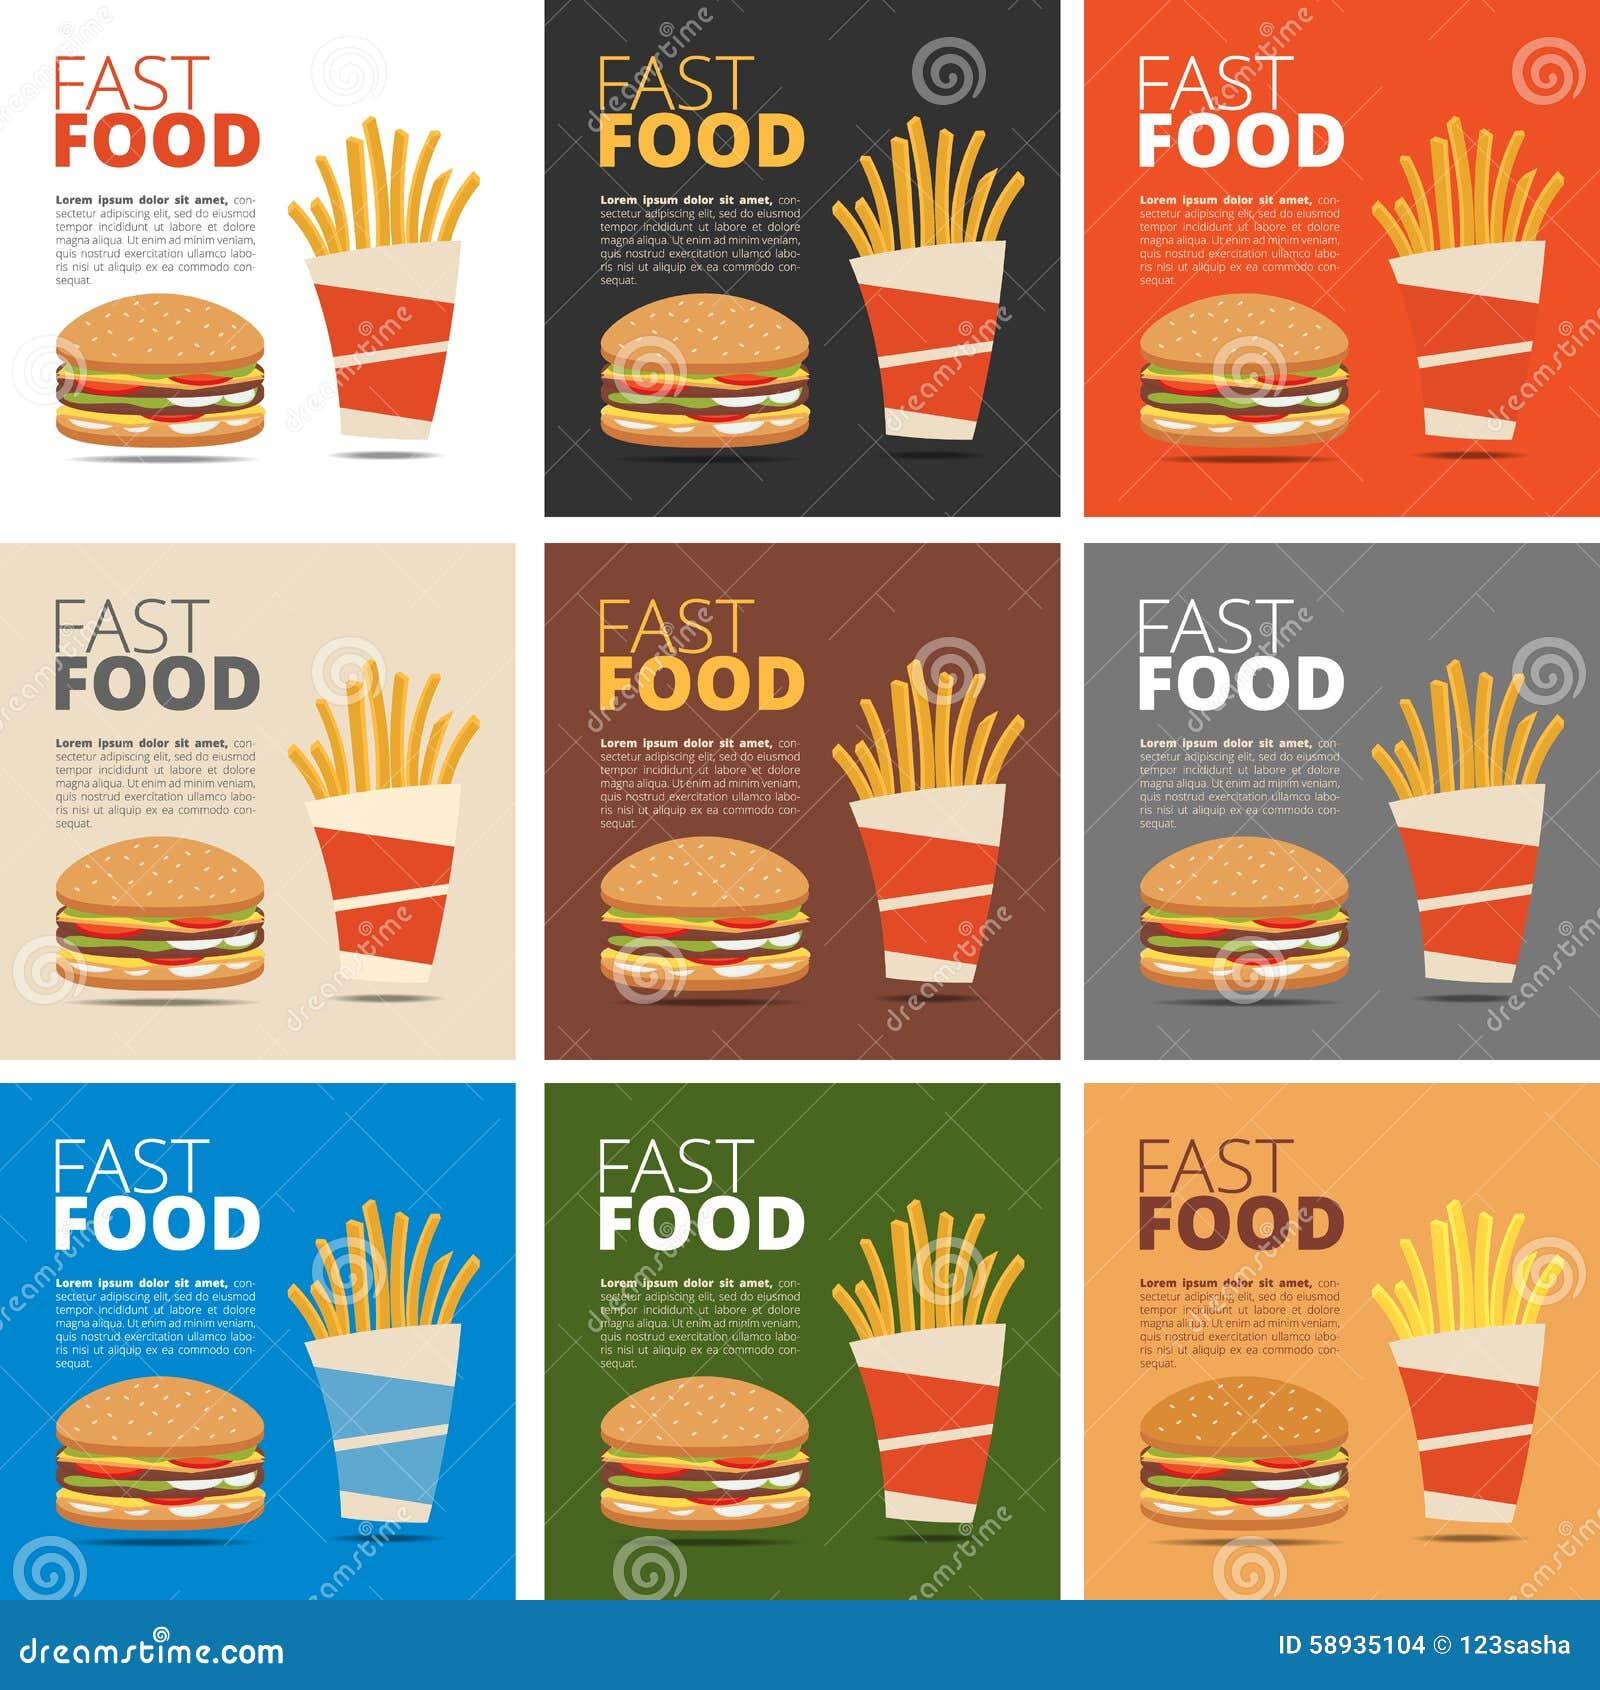 Fast Food Restaurants With Secret Menus